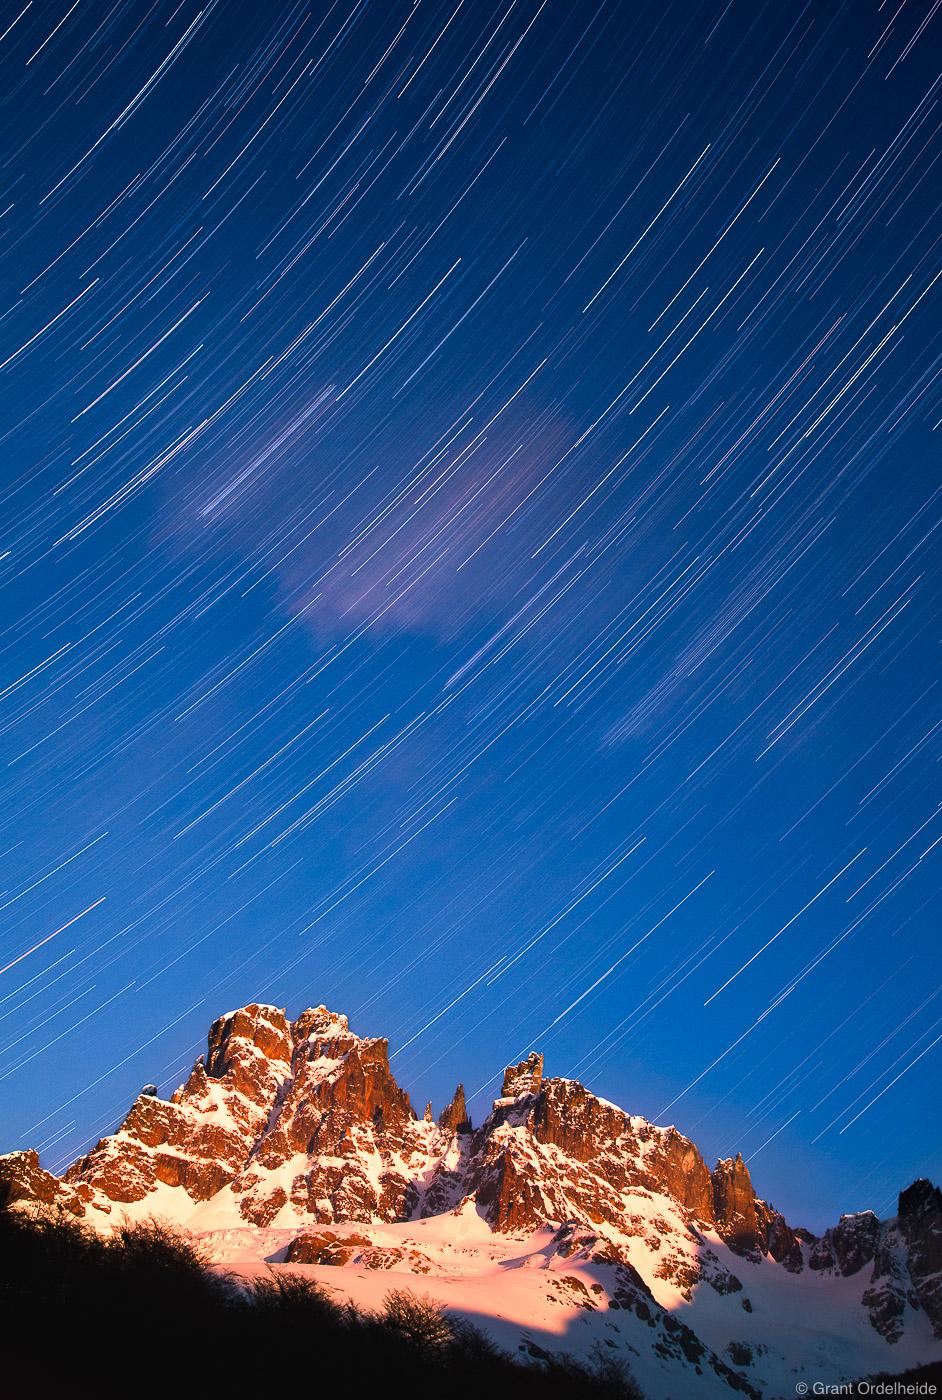 cerro, castillo, star, trails, chile, peak, tallest, national, reserve, photo